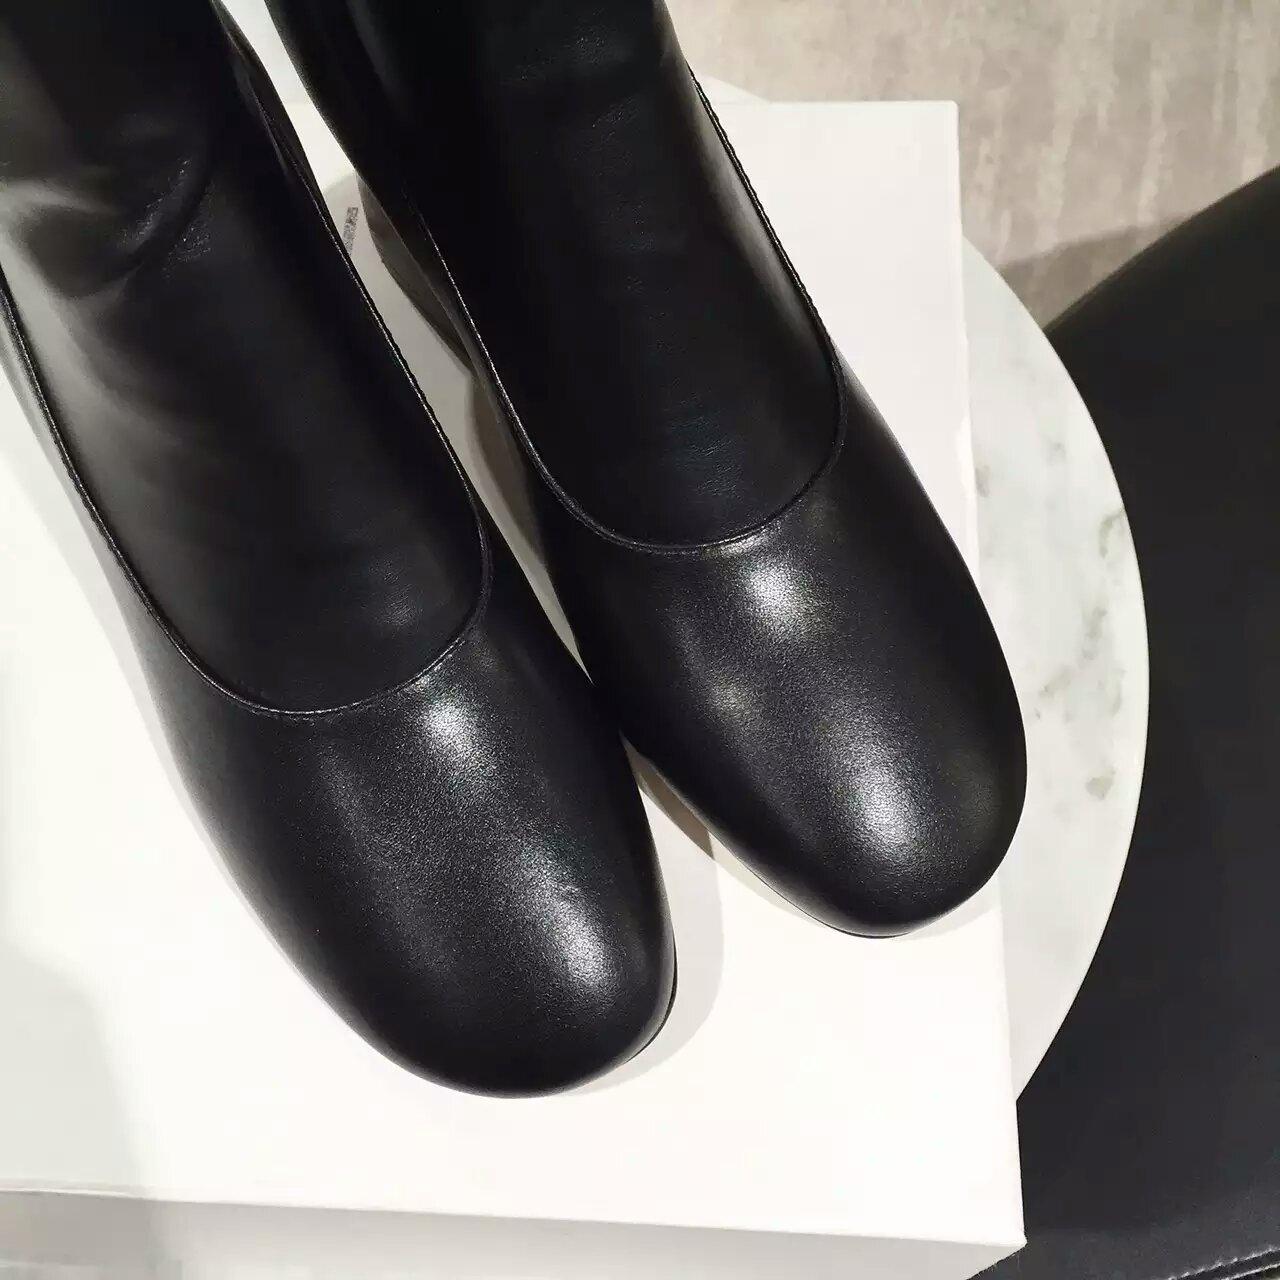 Celine 16秋冬最新款弹力短靴 原版专柜品质复刻